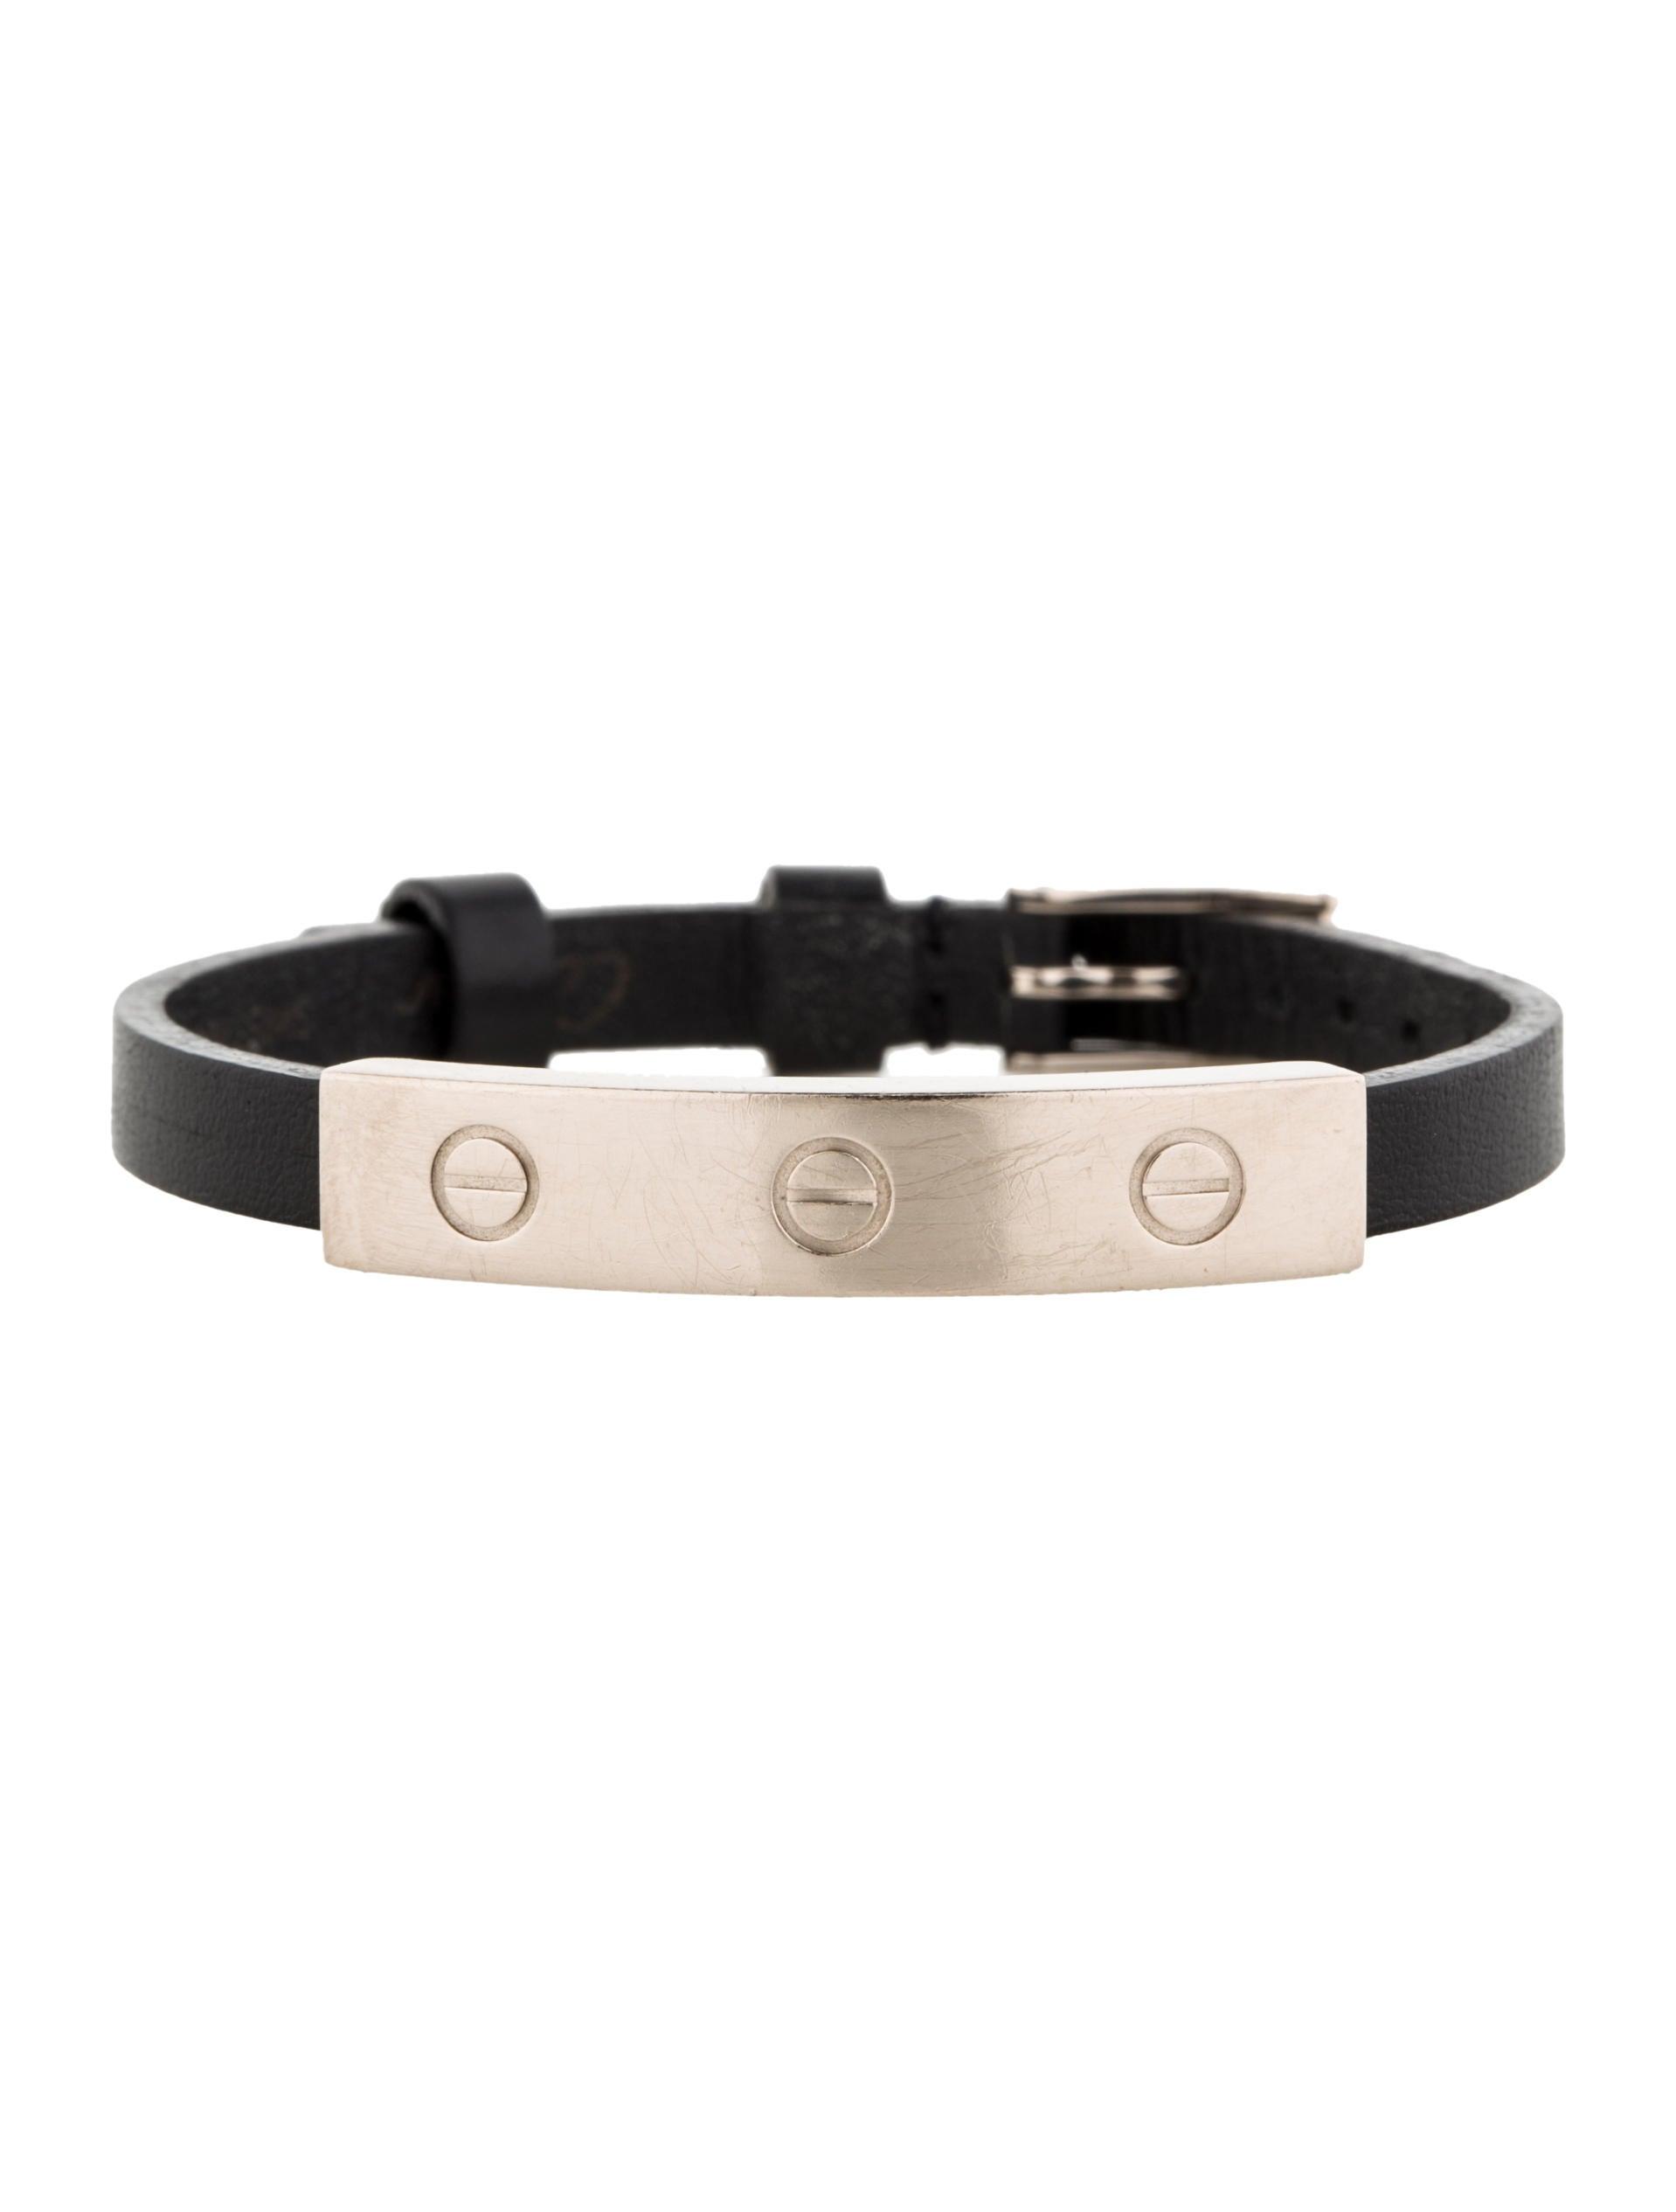 Cartier Leather Love Bracelet Bracelets Crt21438 The